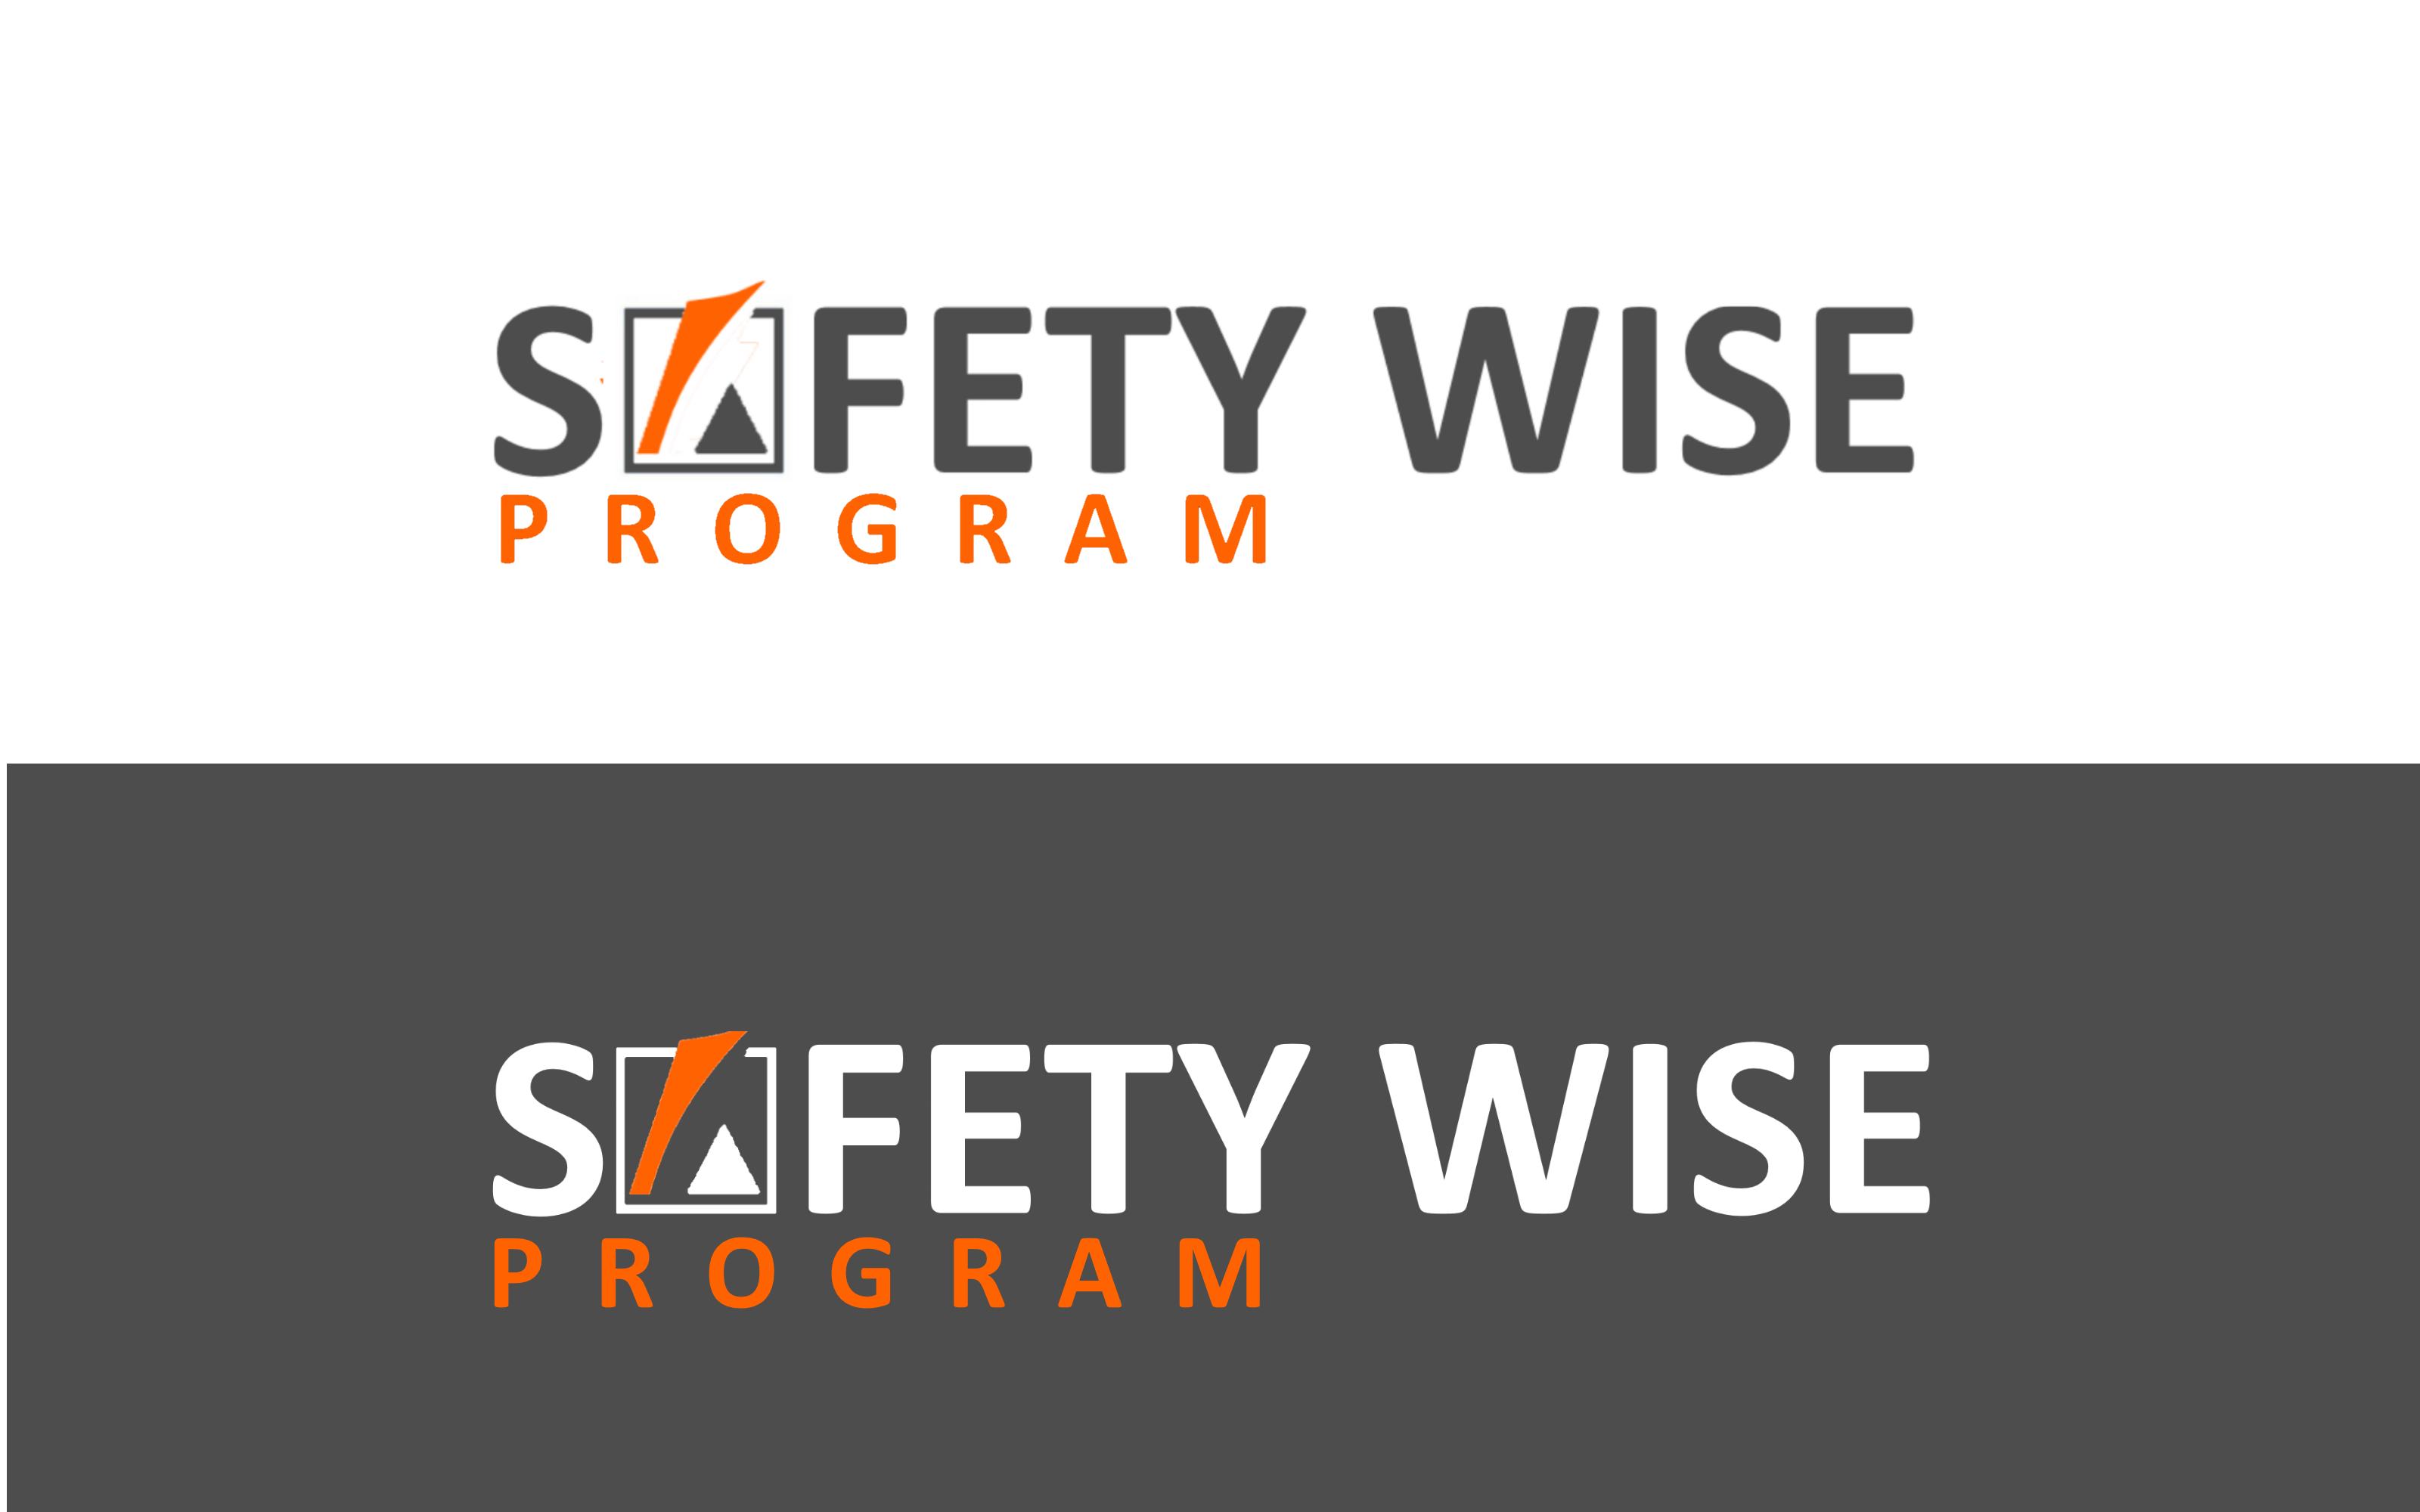 Logo Design by Roberto Bassi - Entry No. 165 in the Logo Design Contest New Logo Design for Safety Wise Program.